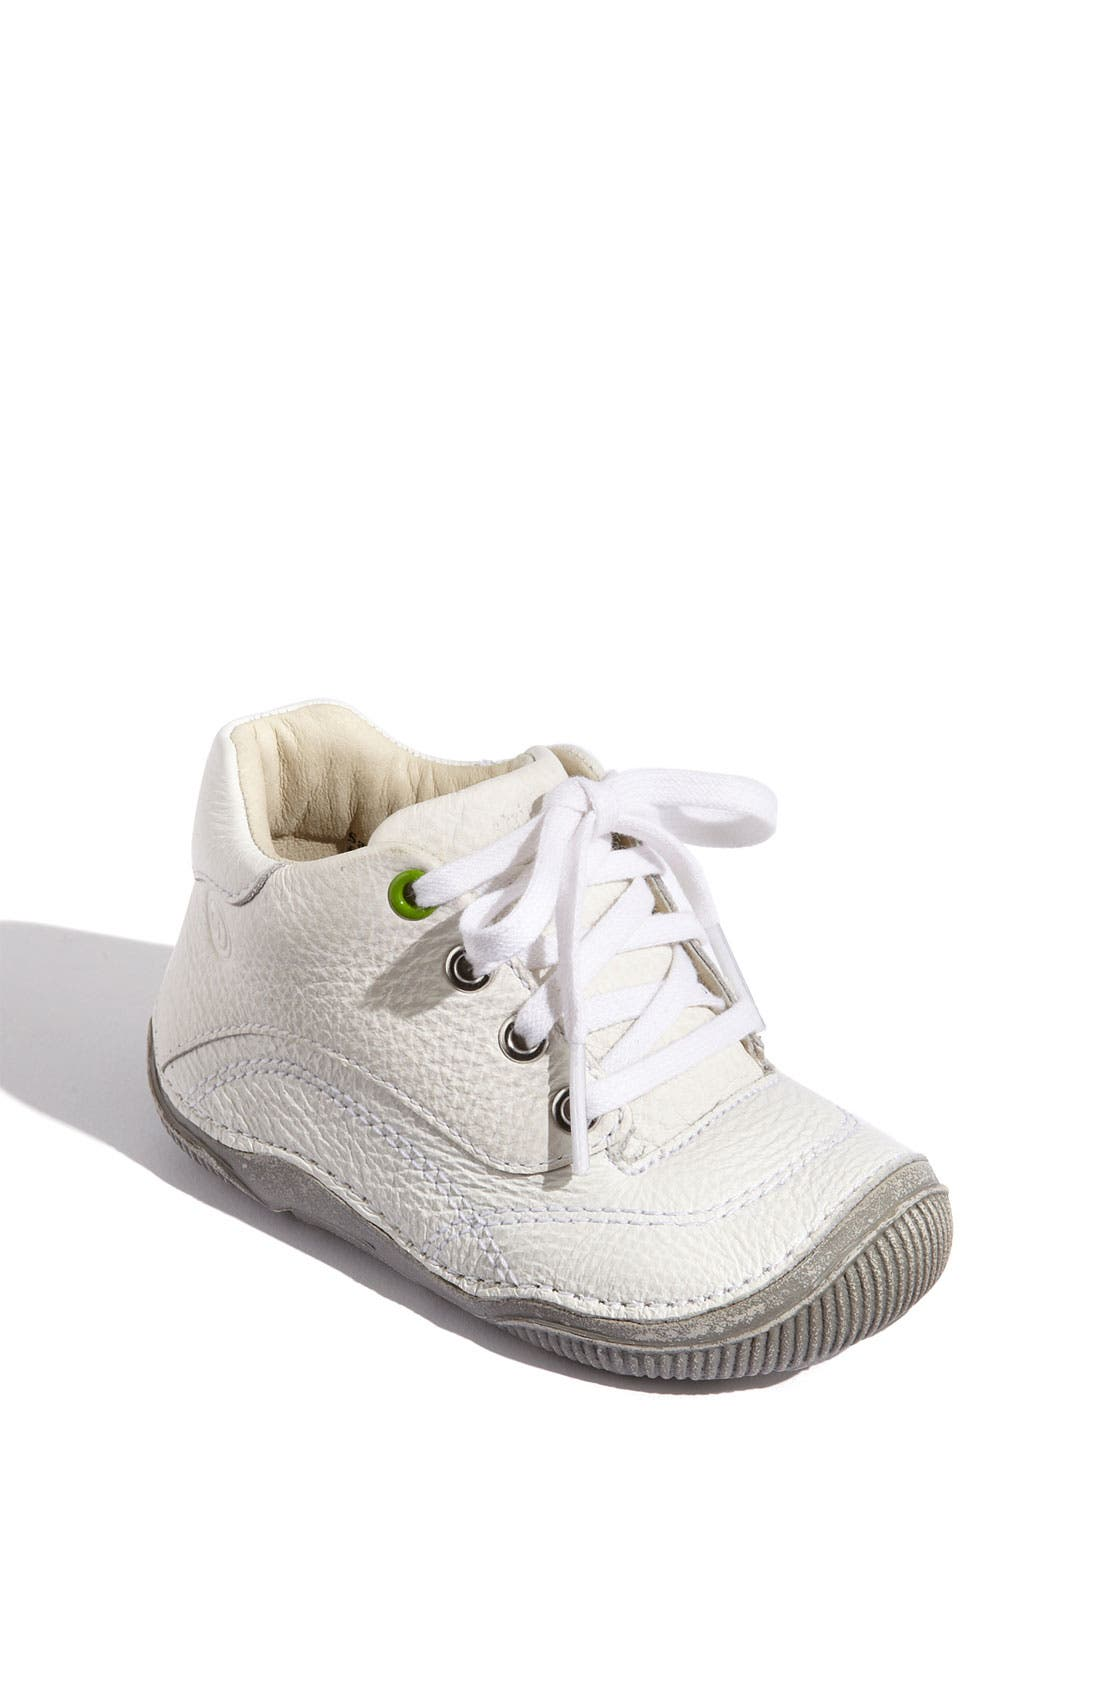 Main Image - Stride Rite 'Brattle' Sneaker (Baby, Walker & Toddler)